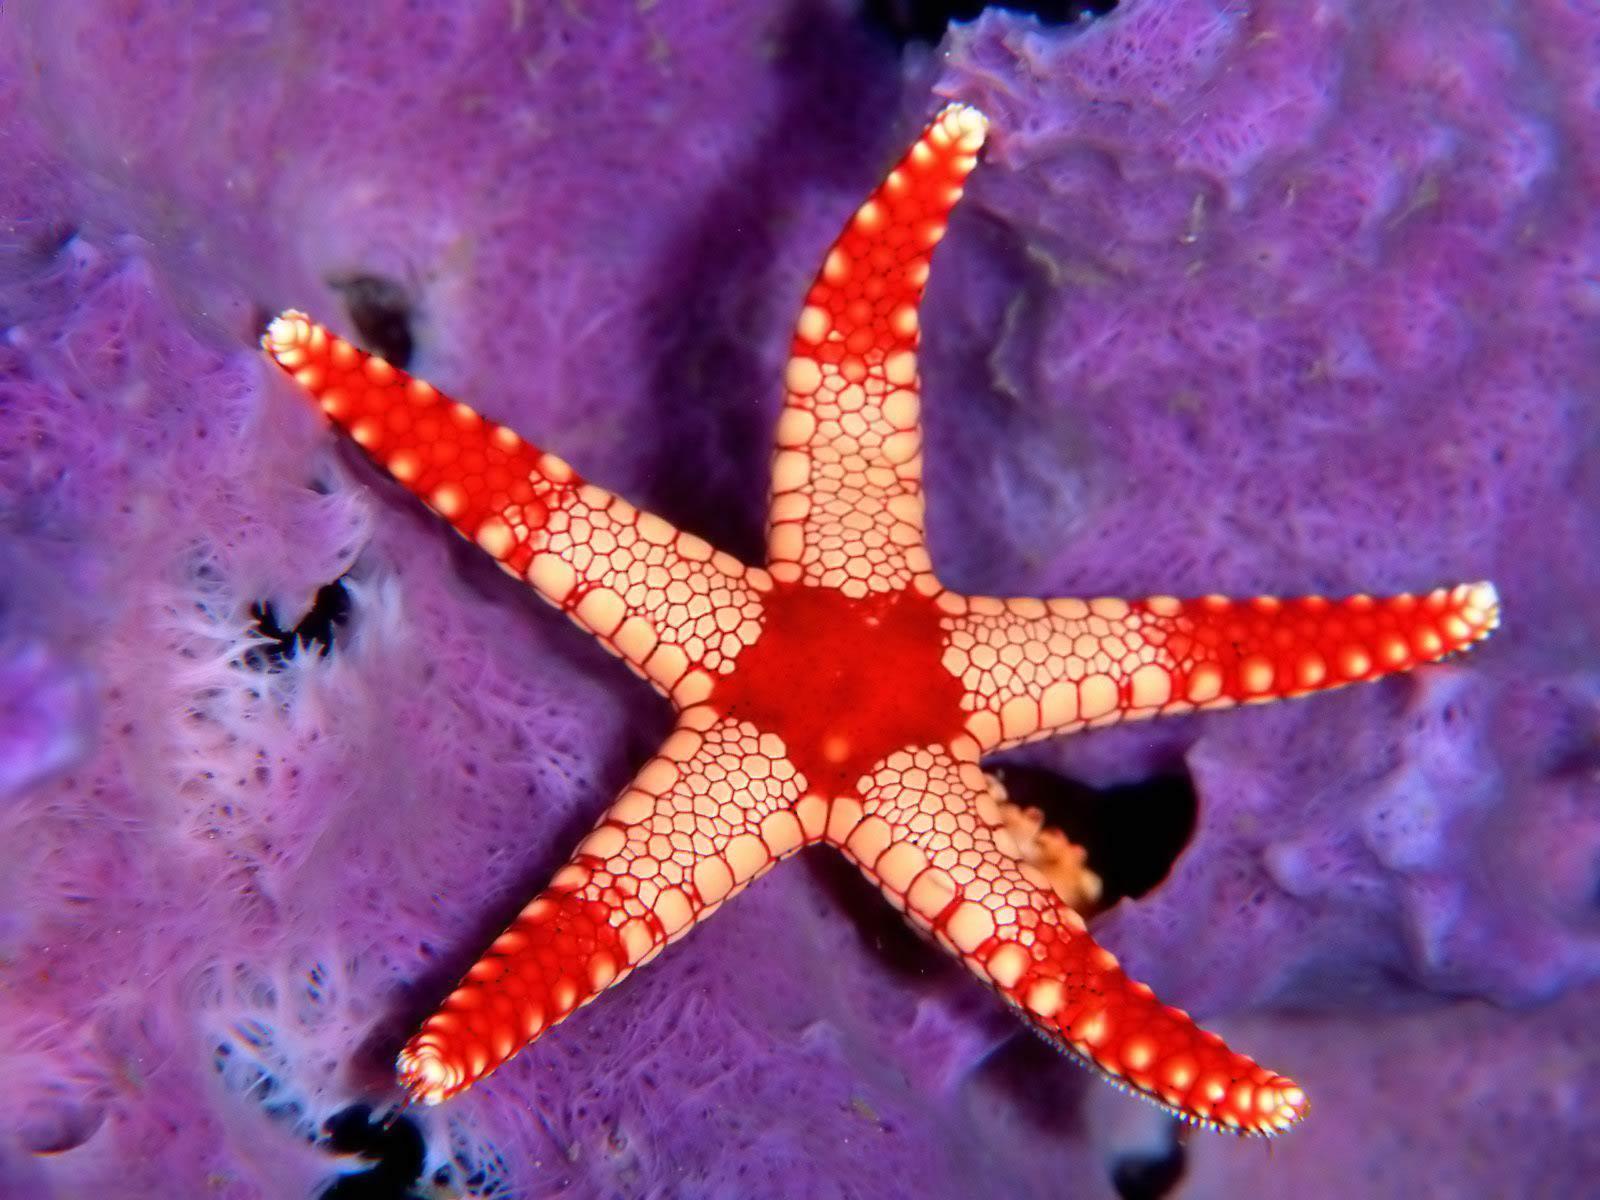 Desktop backgrounds · Animal Life · Underwater Sea Star - Palau, Micronesia